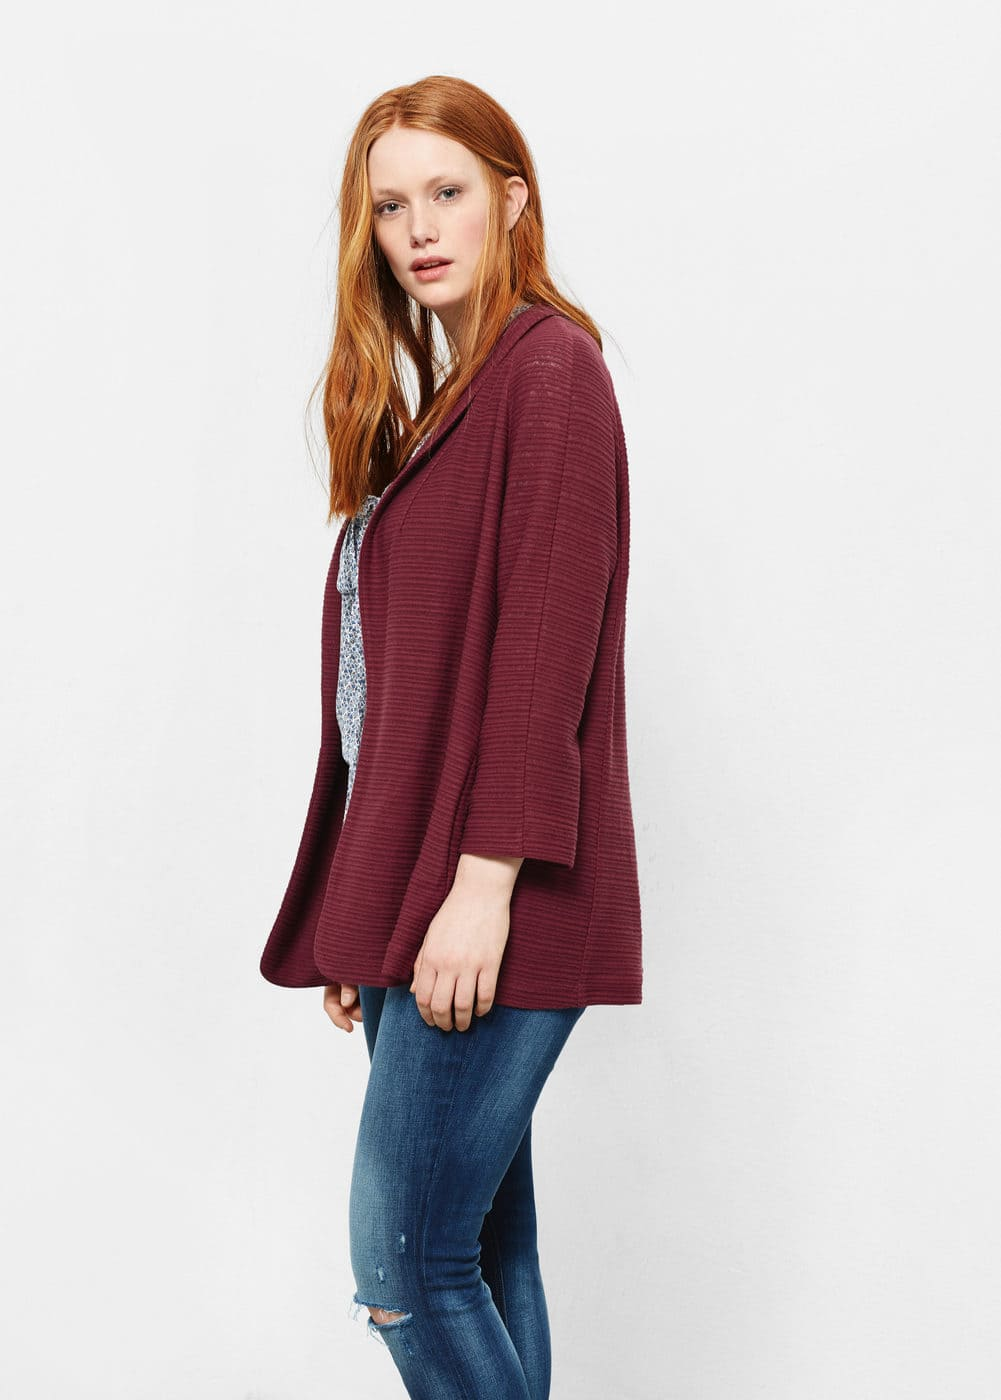 Textured cotton-blend jacket | VIOLETA BY MANGO